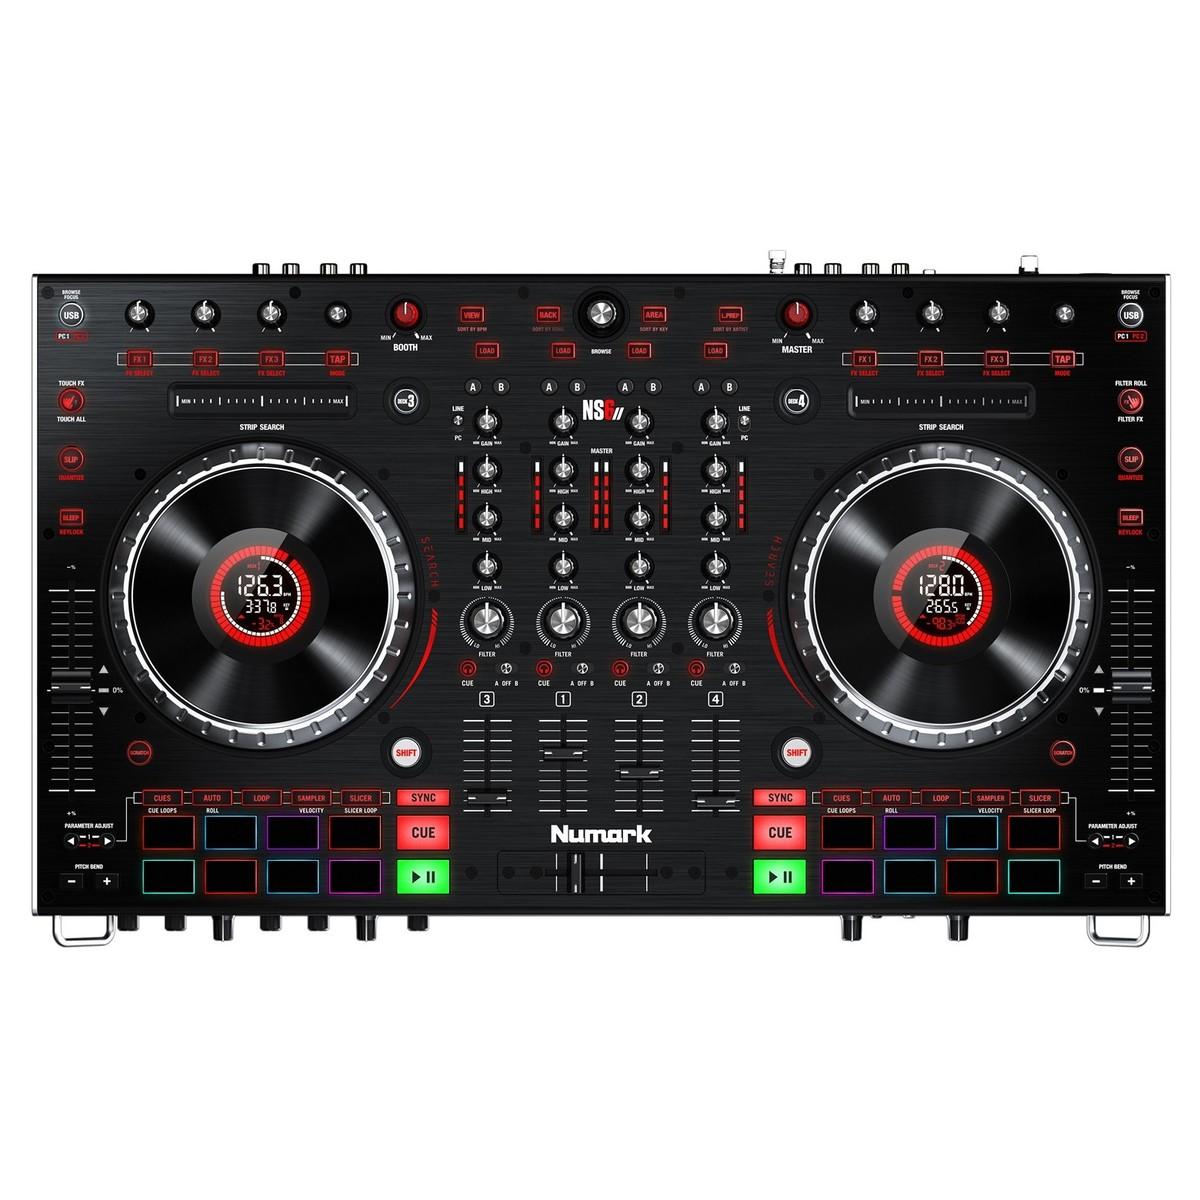 Numark NSII 4-Channel DJ Controller